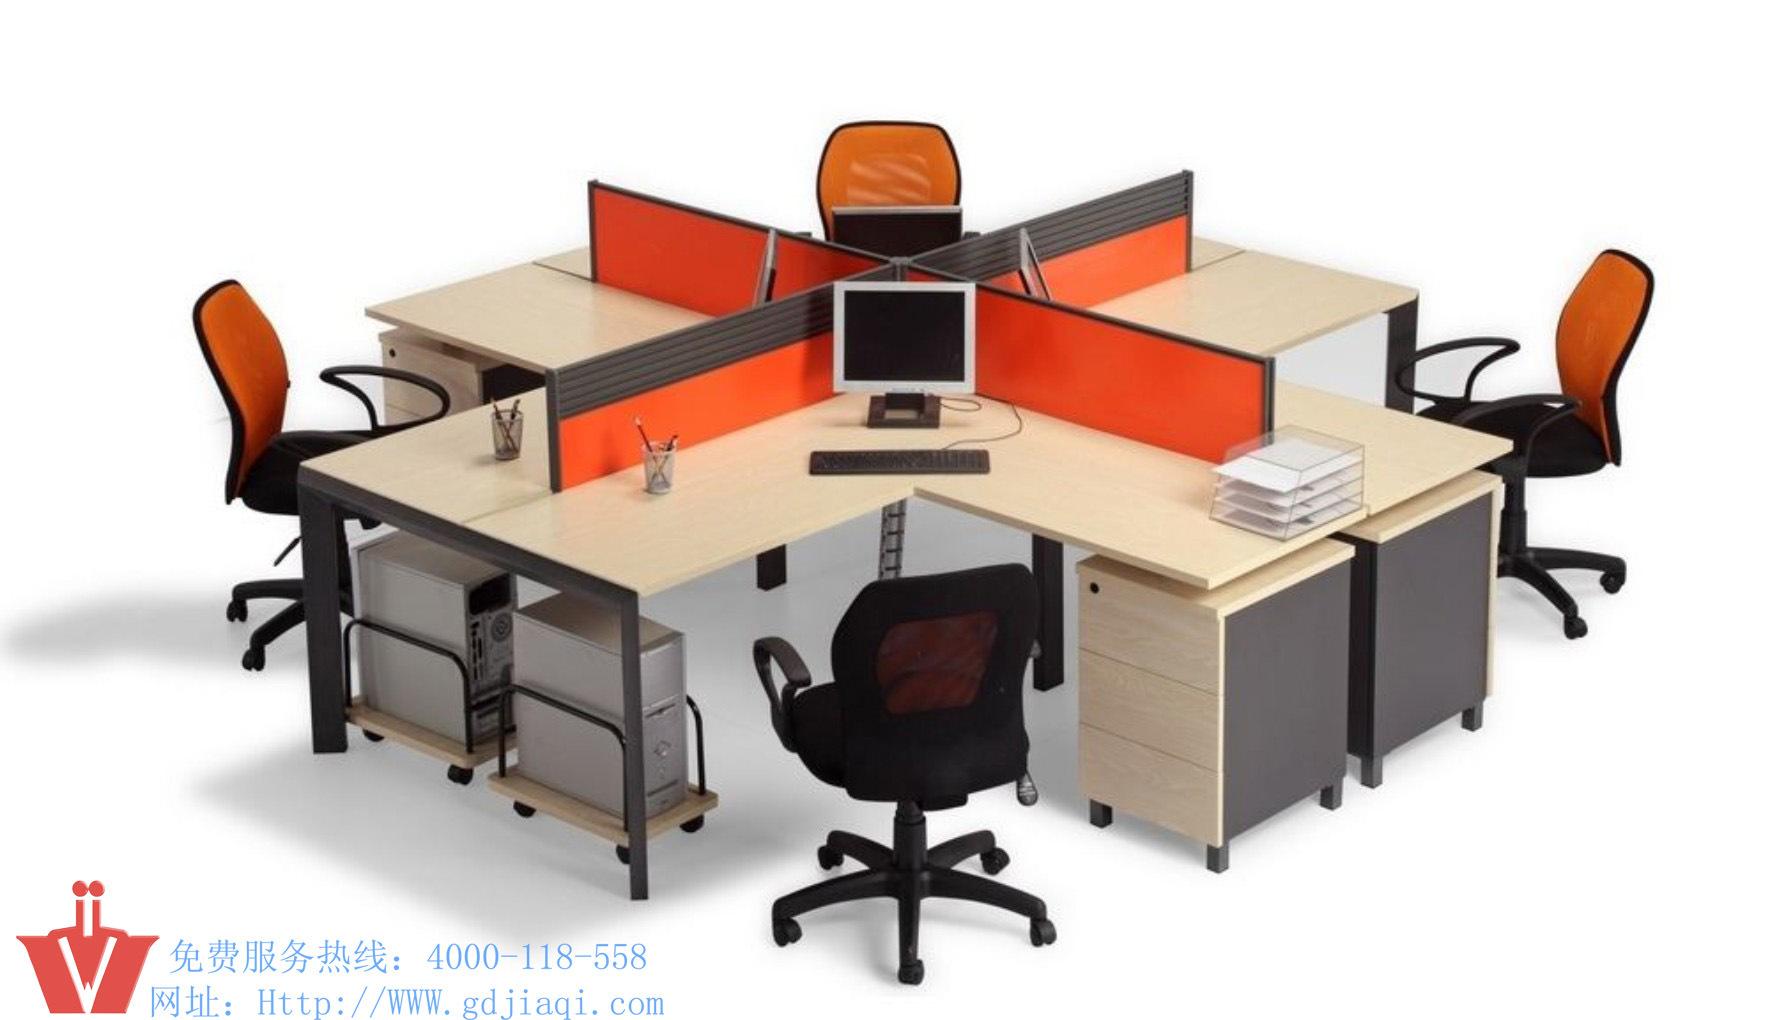 muebles de oficinas wp2 2016 muebles de oficinas wp2